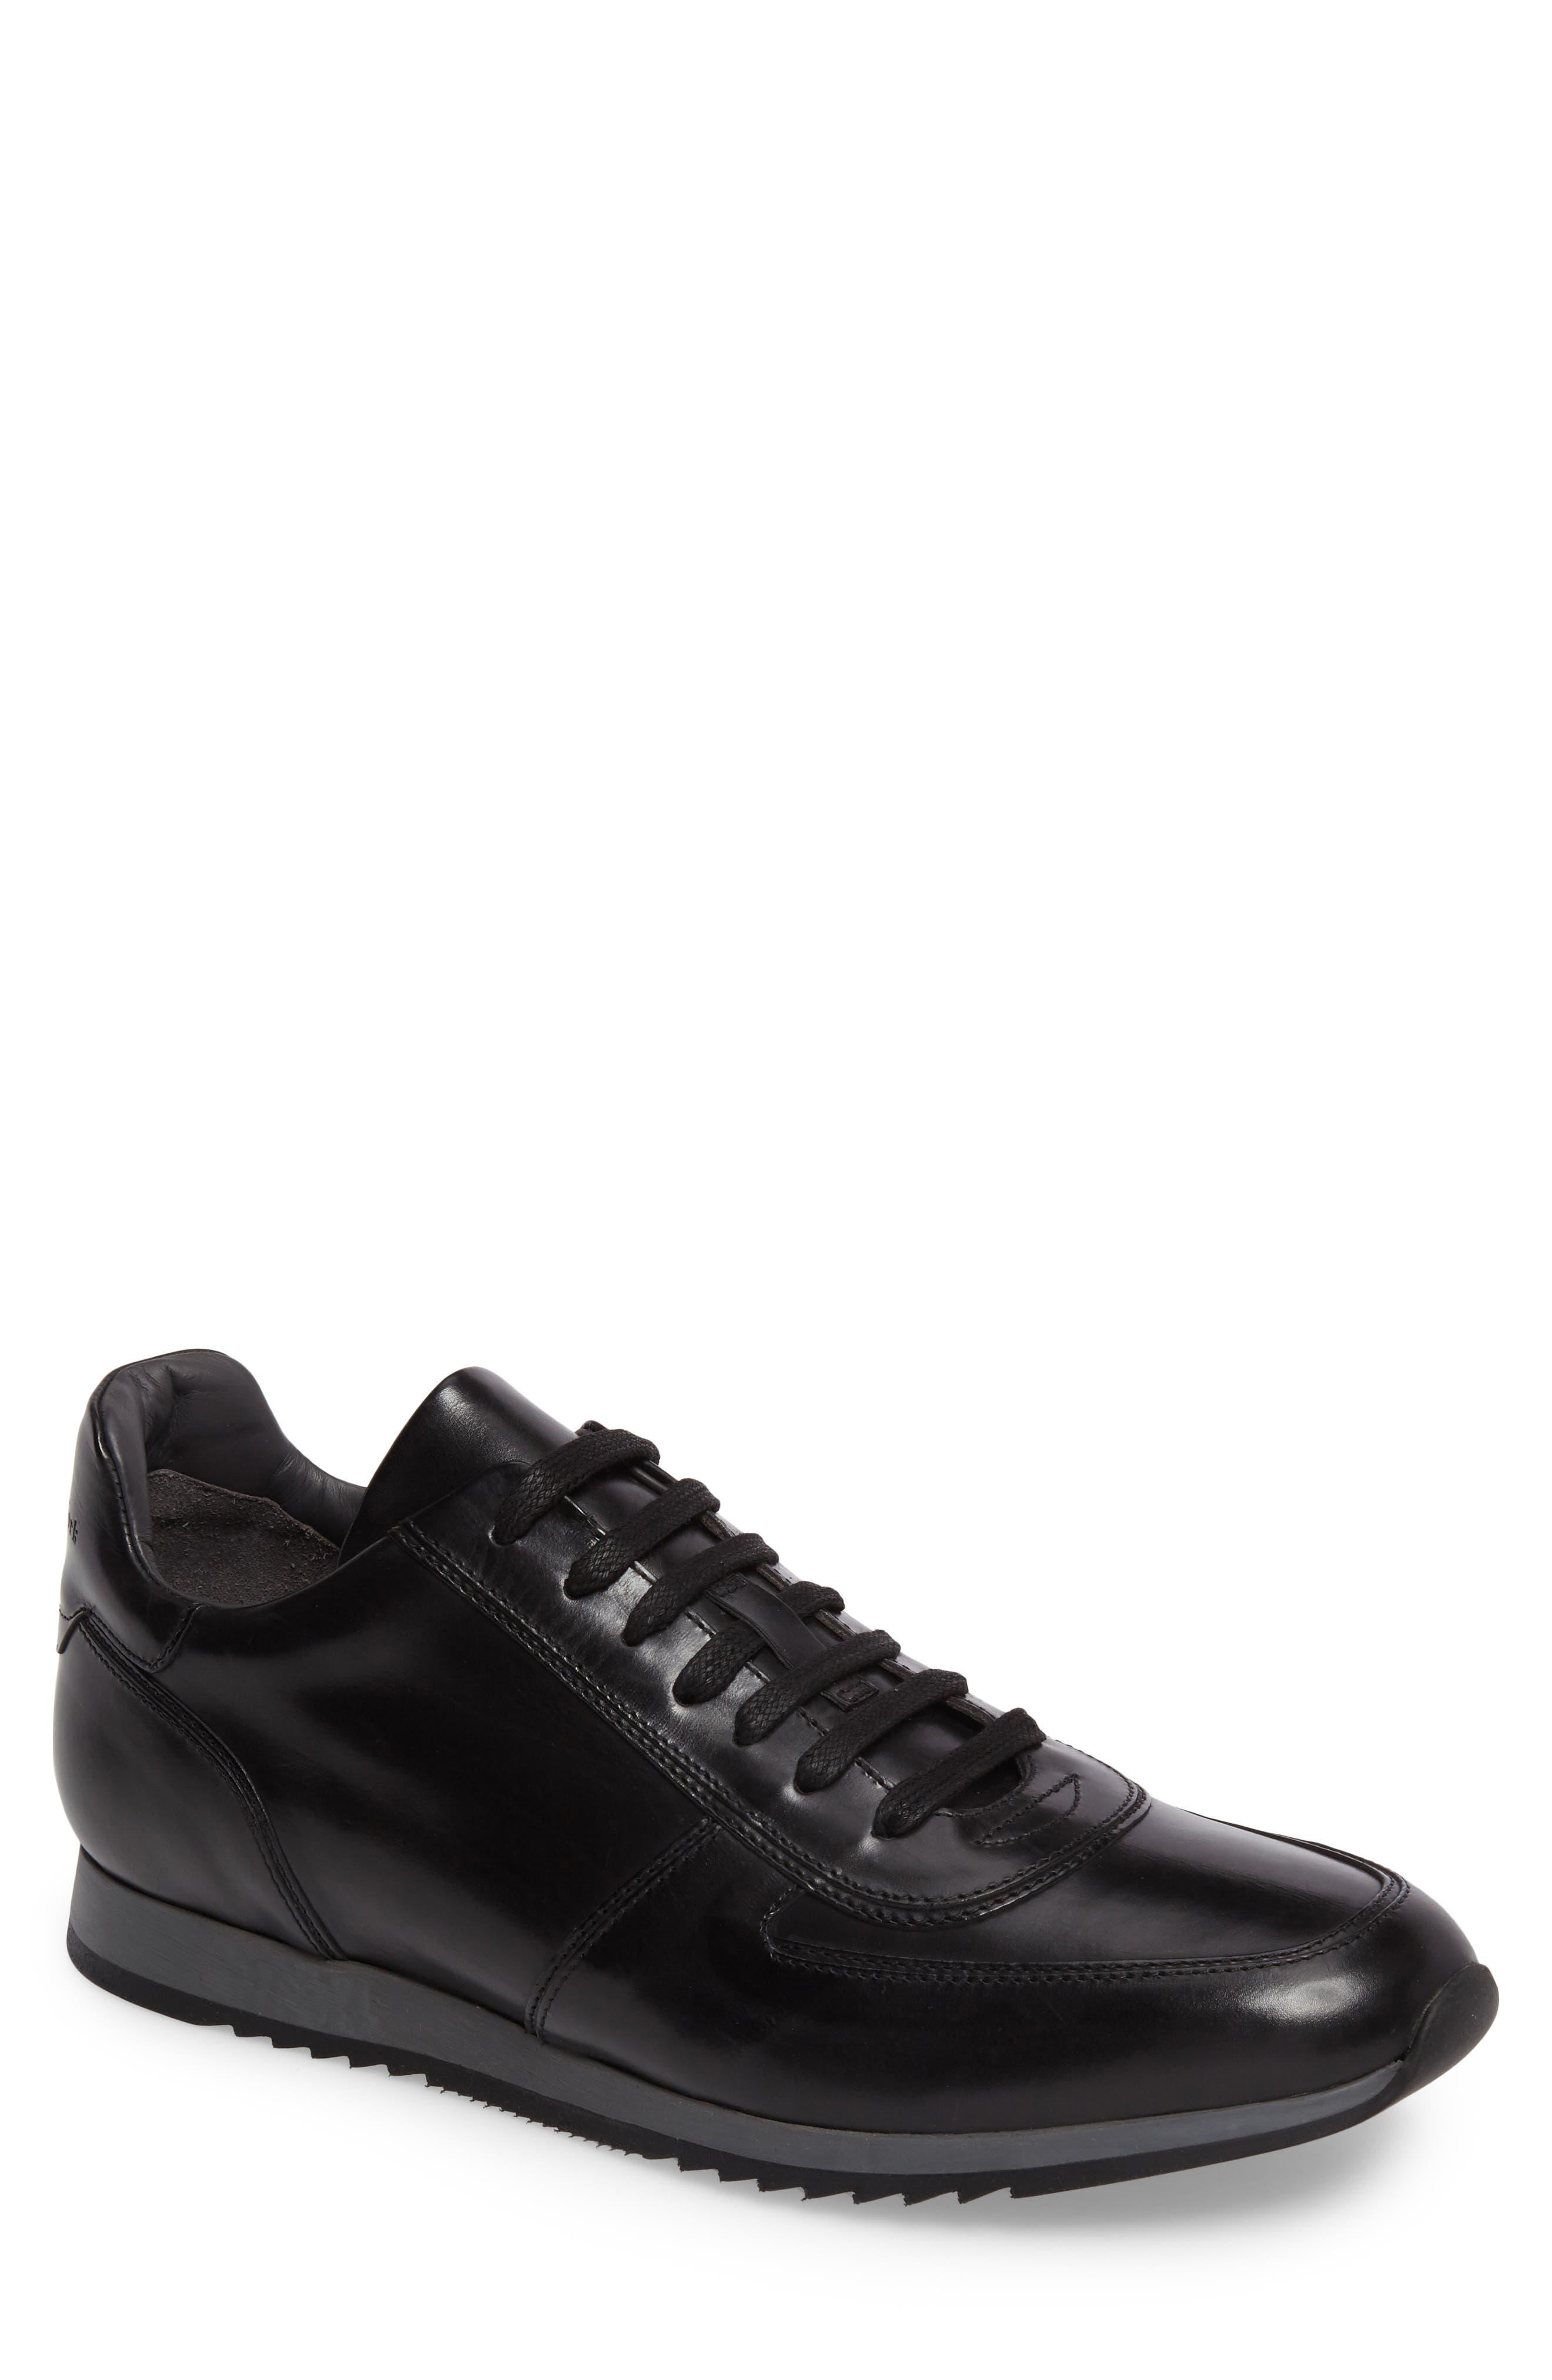 Hatton Sneaker,                             Main thumbnail 1, color,                             003